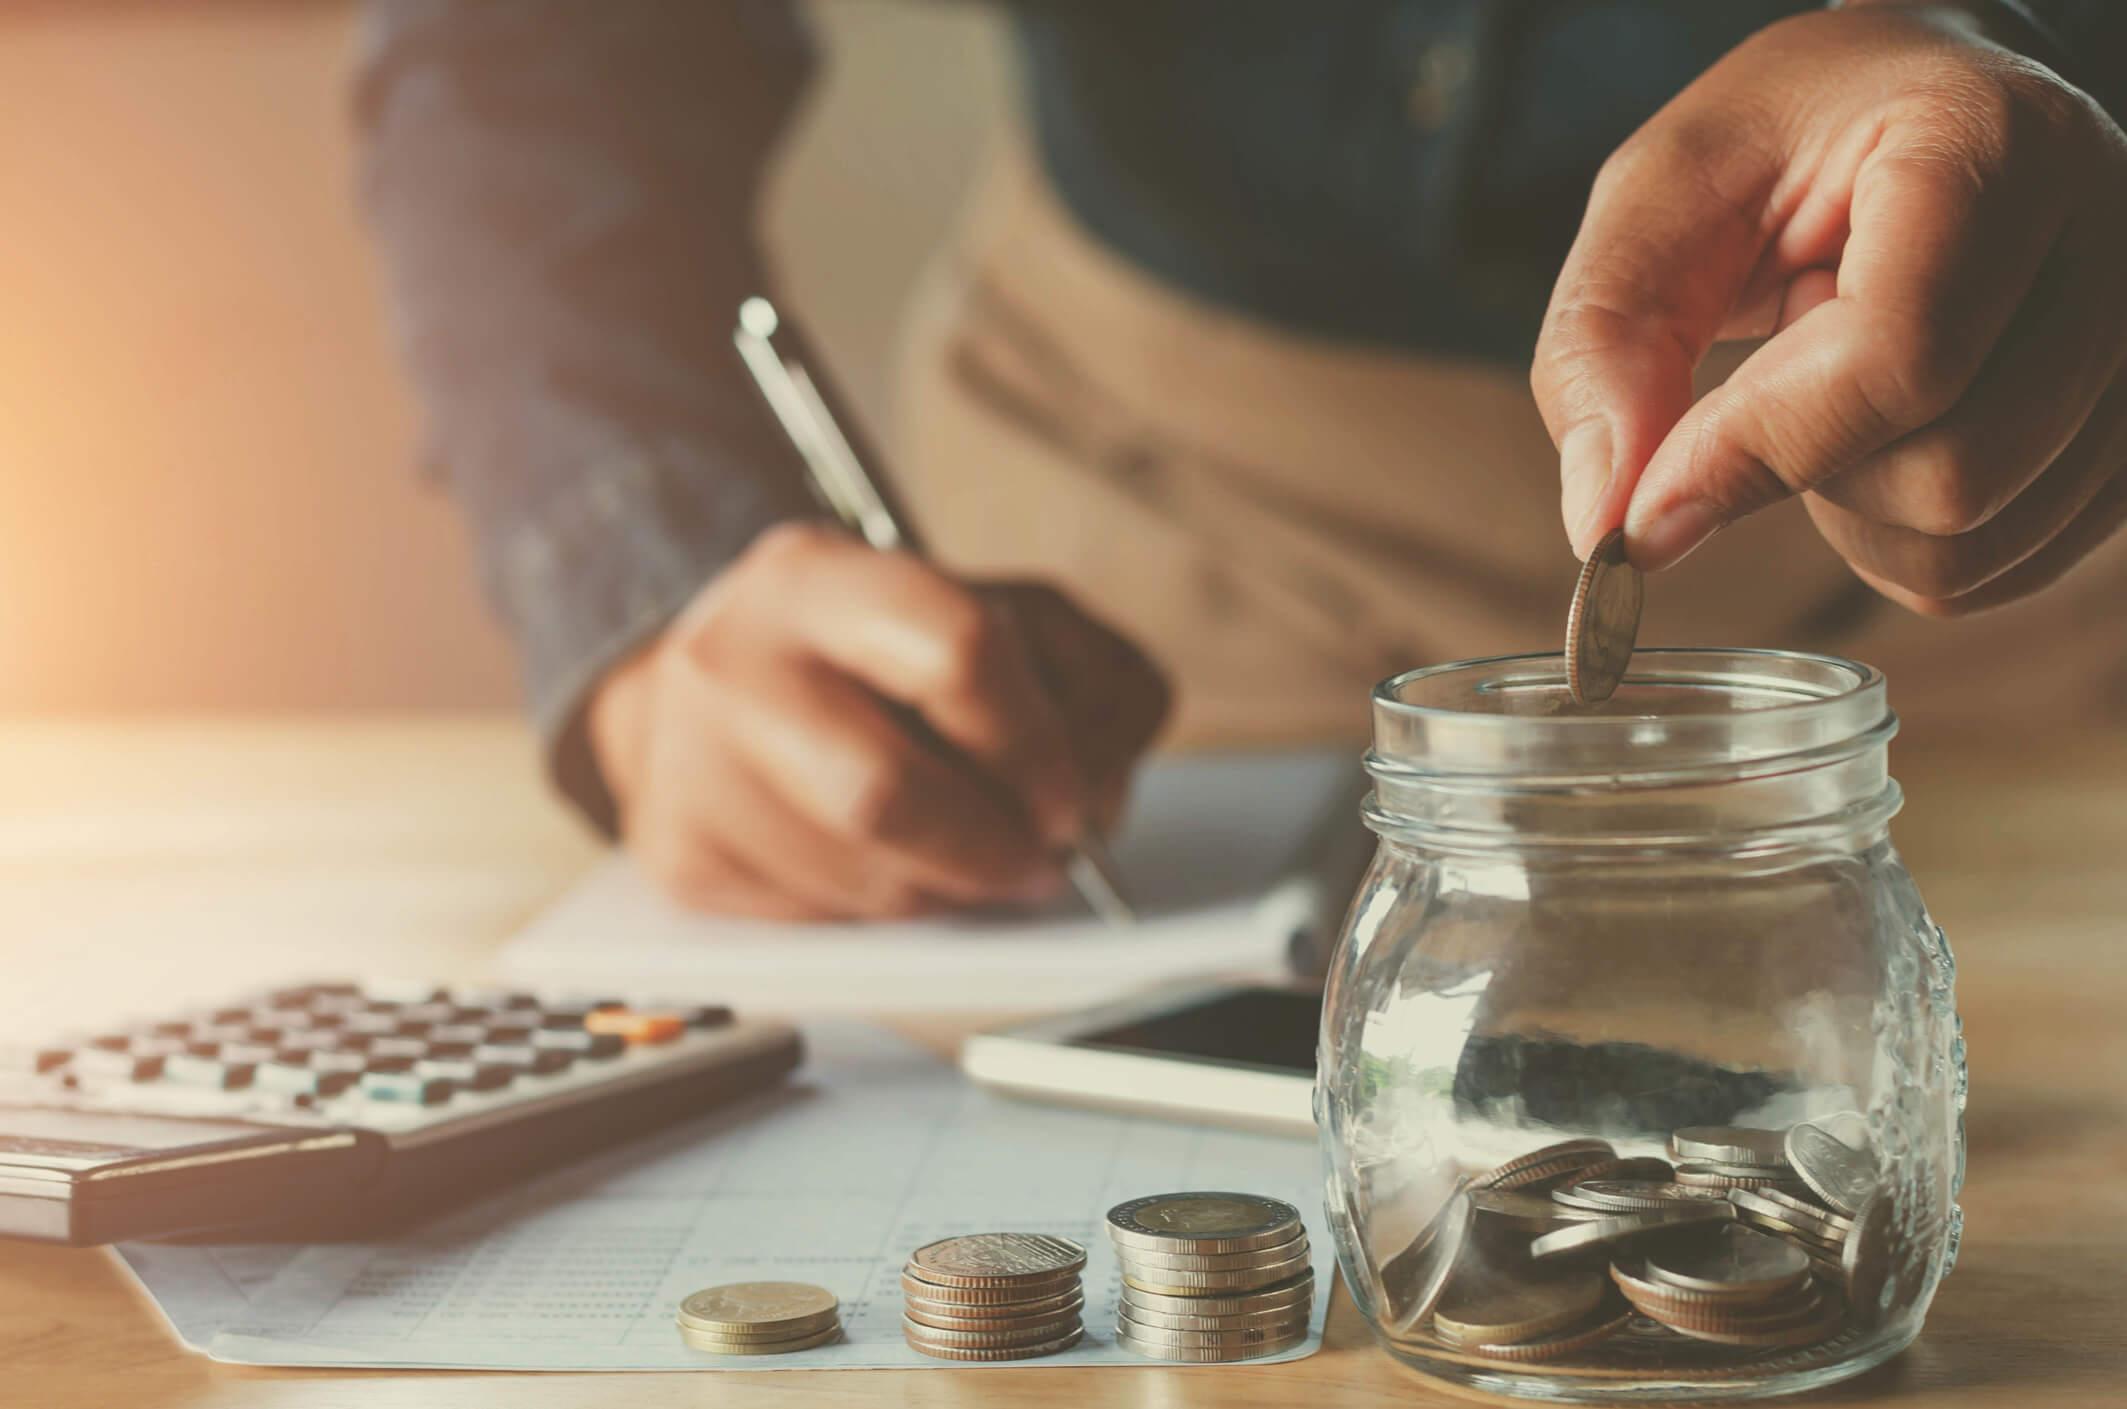 business accountin with saving money.